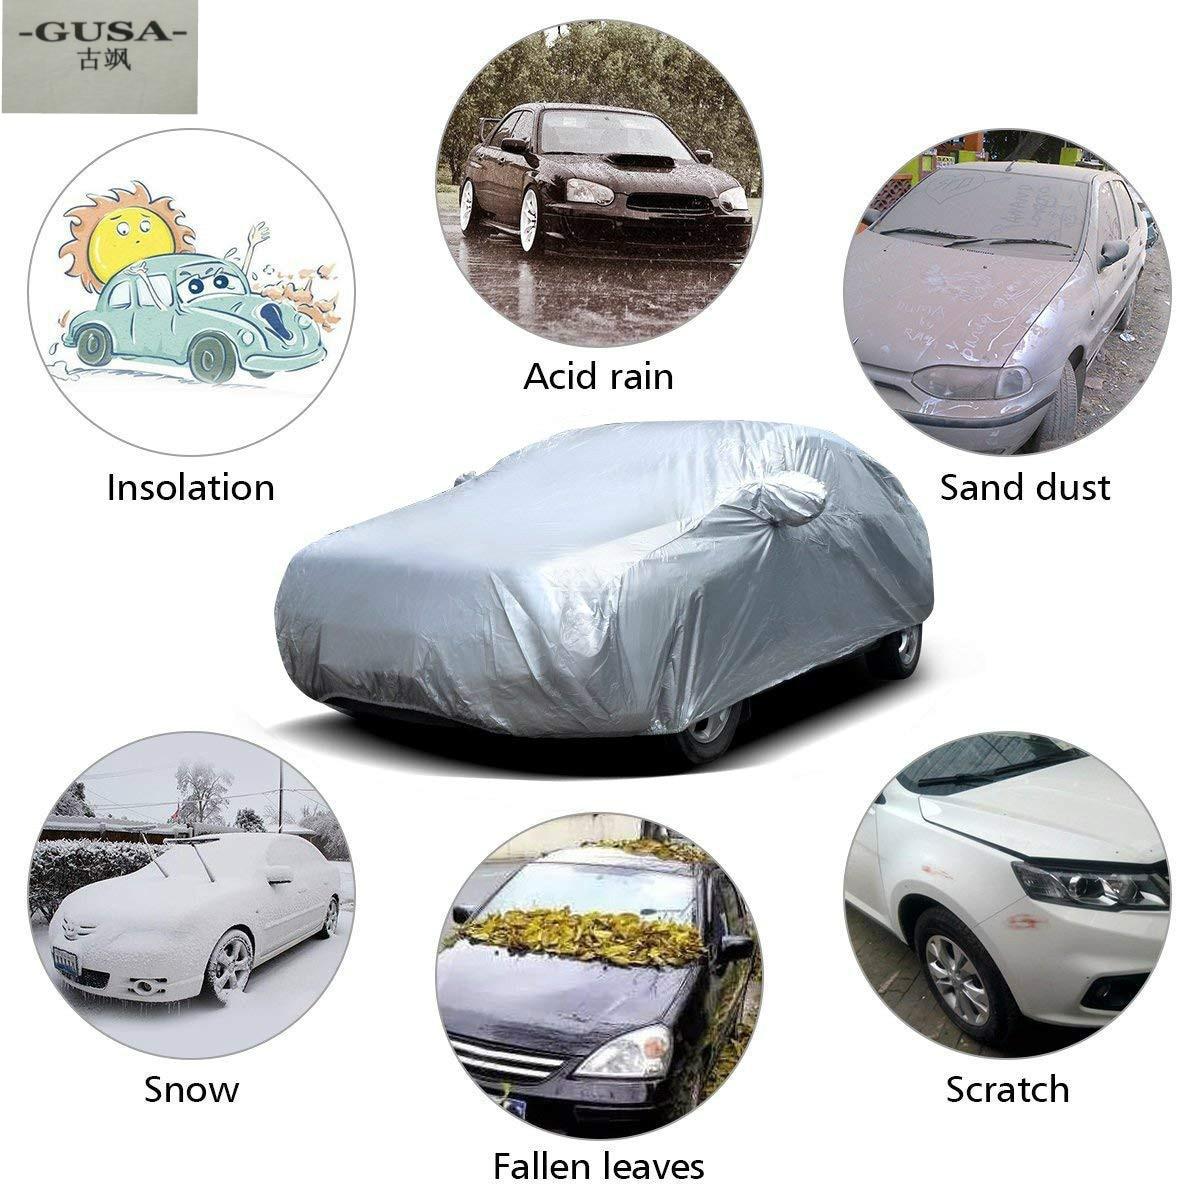 Cubierta de coche para Skoda octavia Rapid Yeti Karoq Kodiaq GT fabia con cremallera de apertura lateral a prueba de polvo impermeable Protector solar